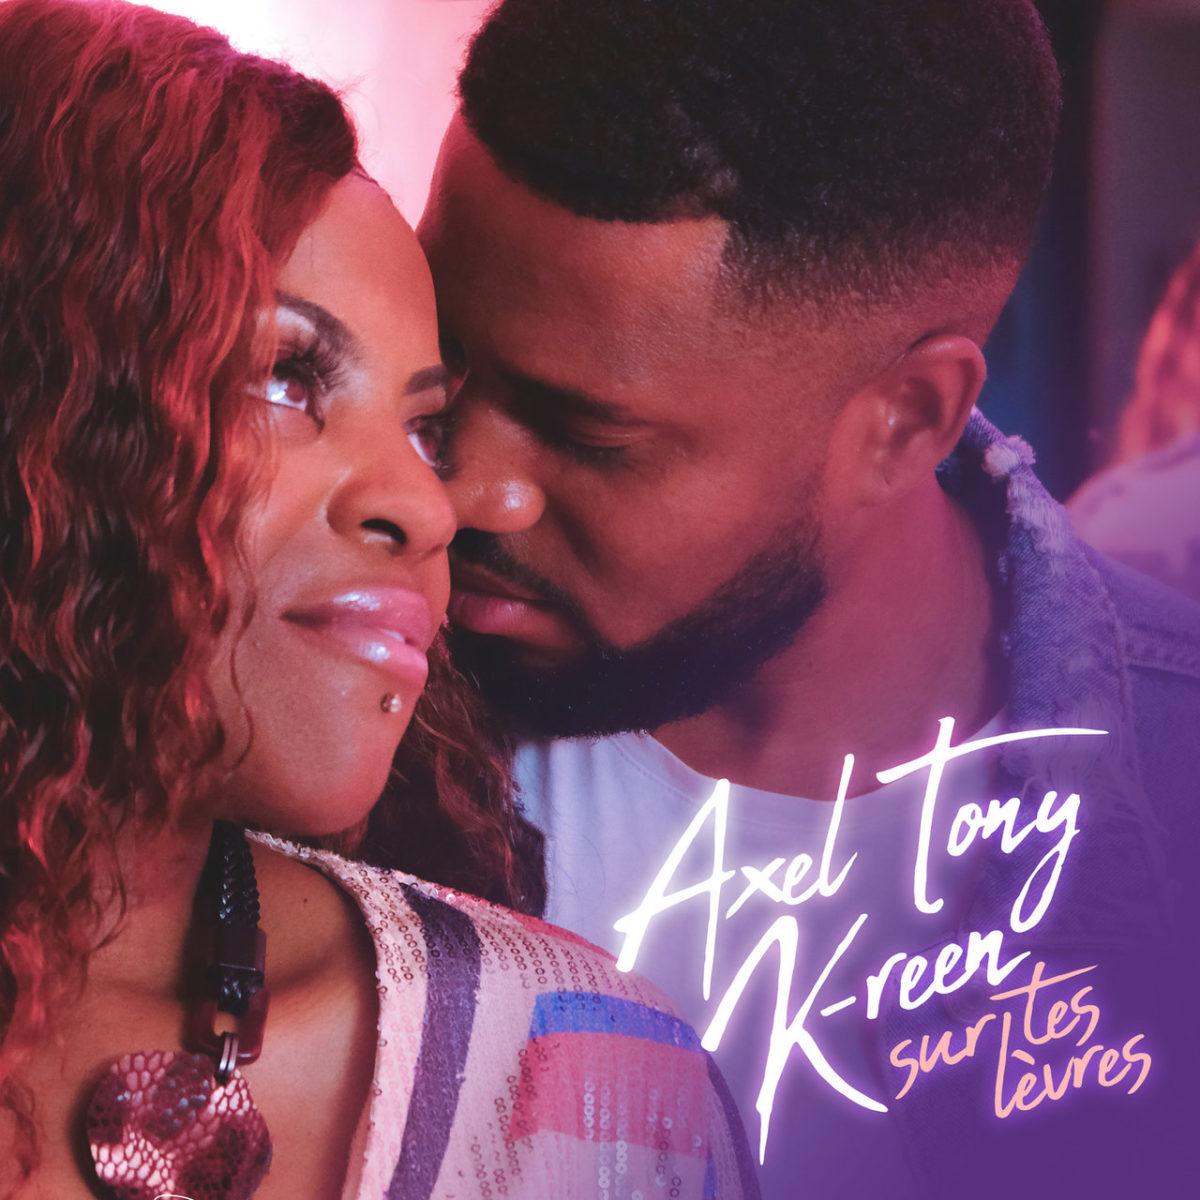 Axel Tony - Sur Tes Lèvres (ft. K-Reen) (Cover)